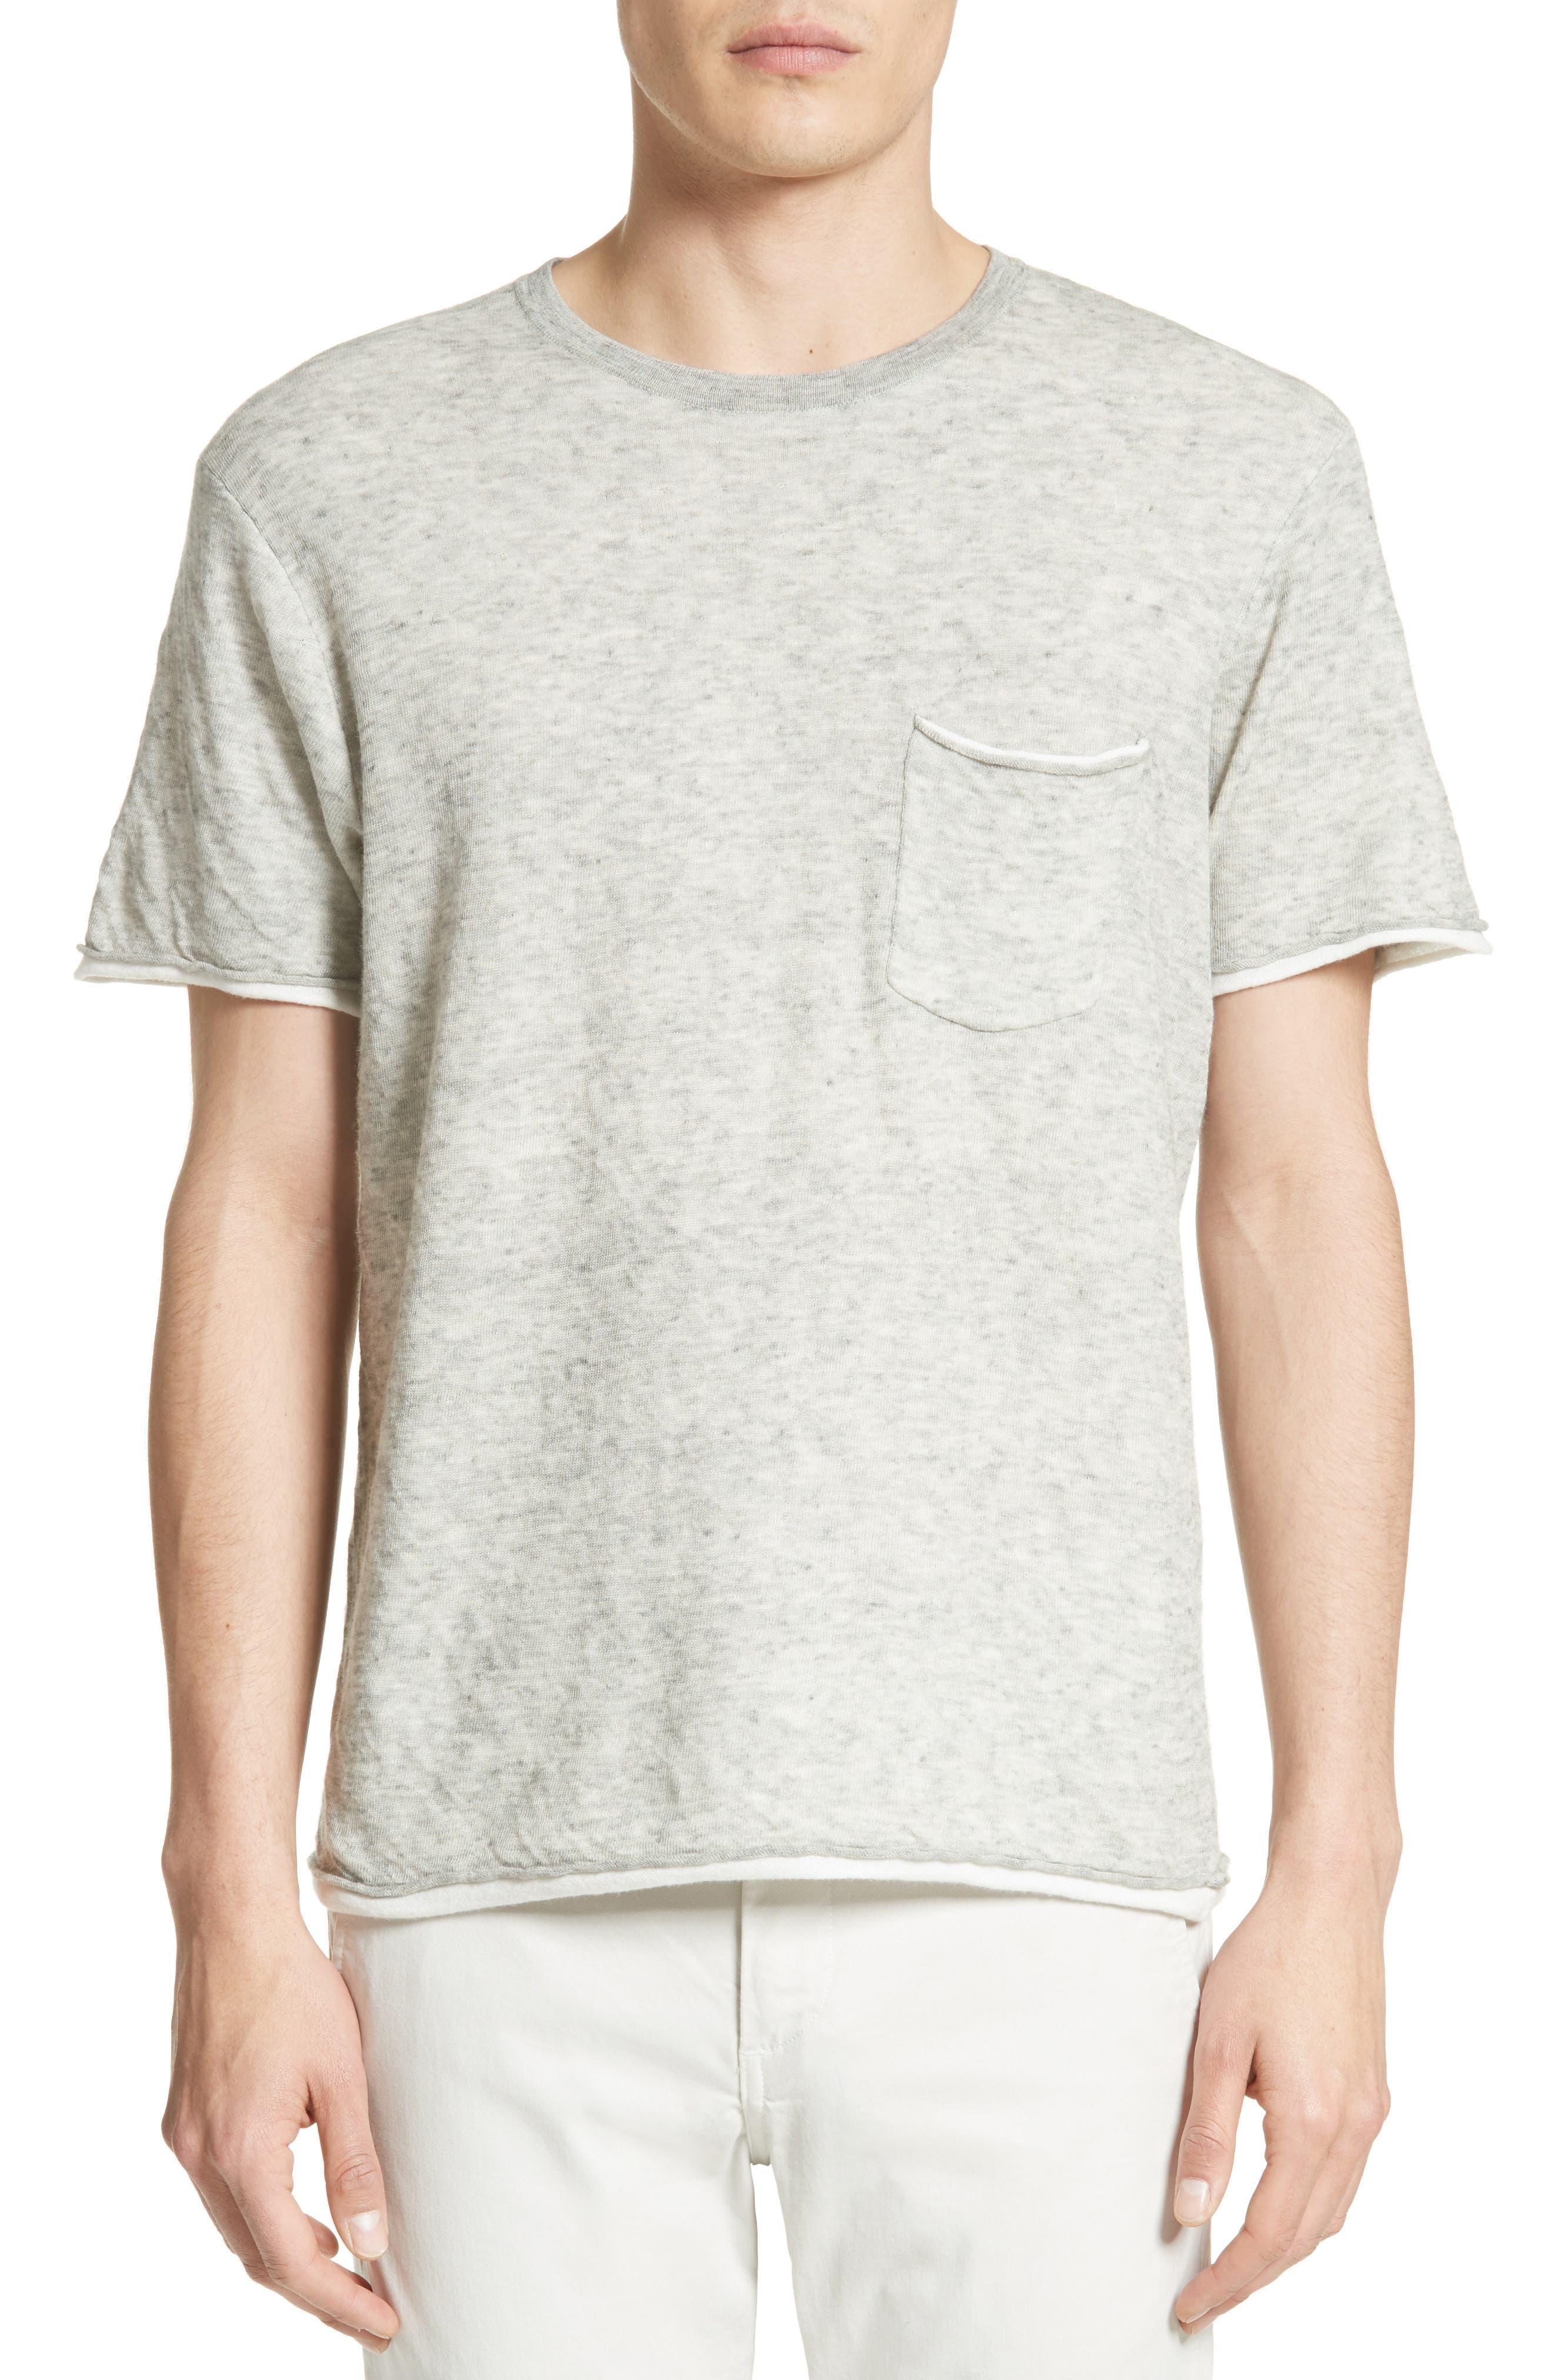 Tripp Cotton & Wool T-Shirt,                             Main thumbnail 1, color,                             068